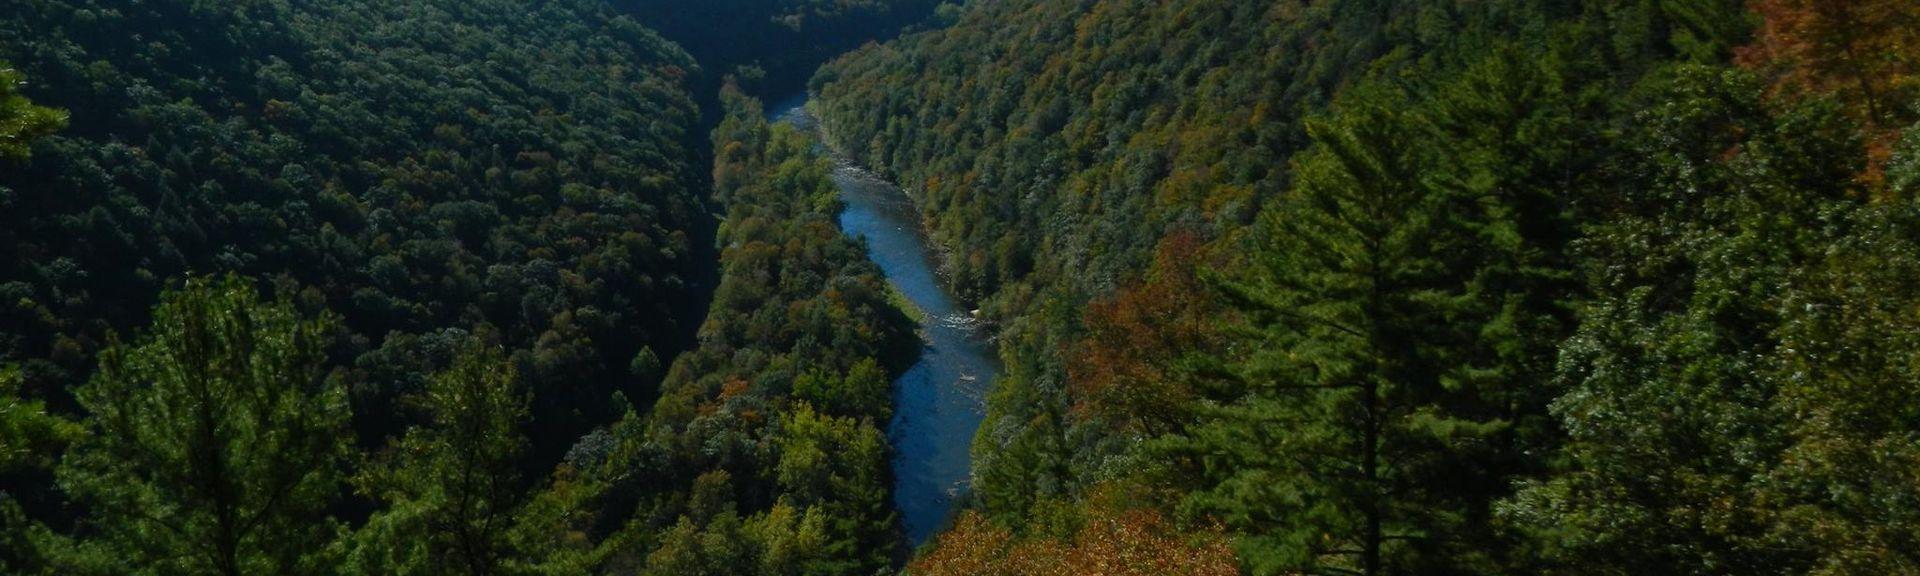 Tioga County, Pennsylvania, United States of America